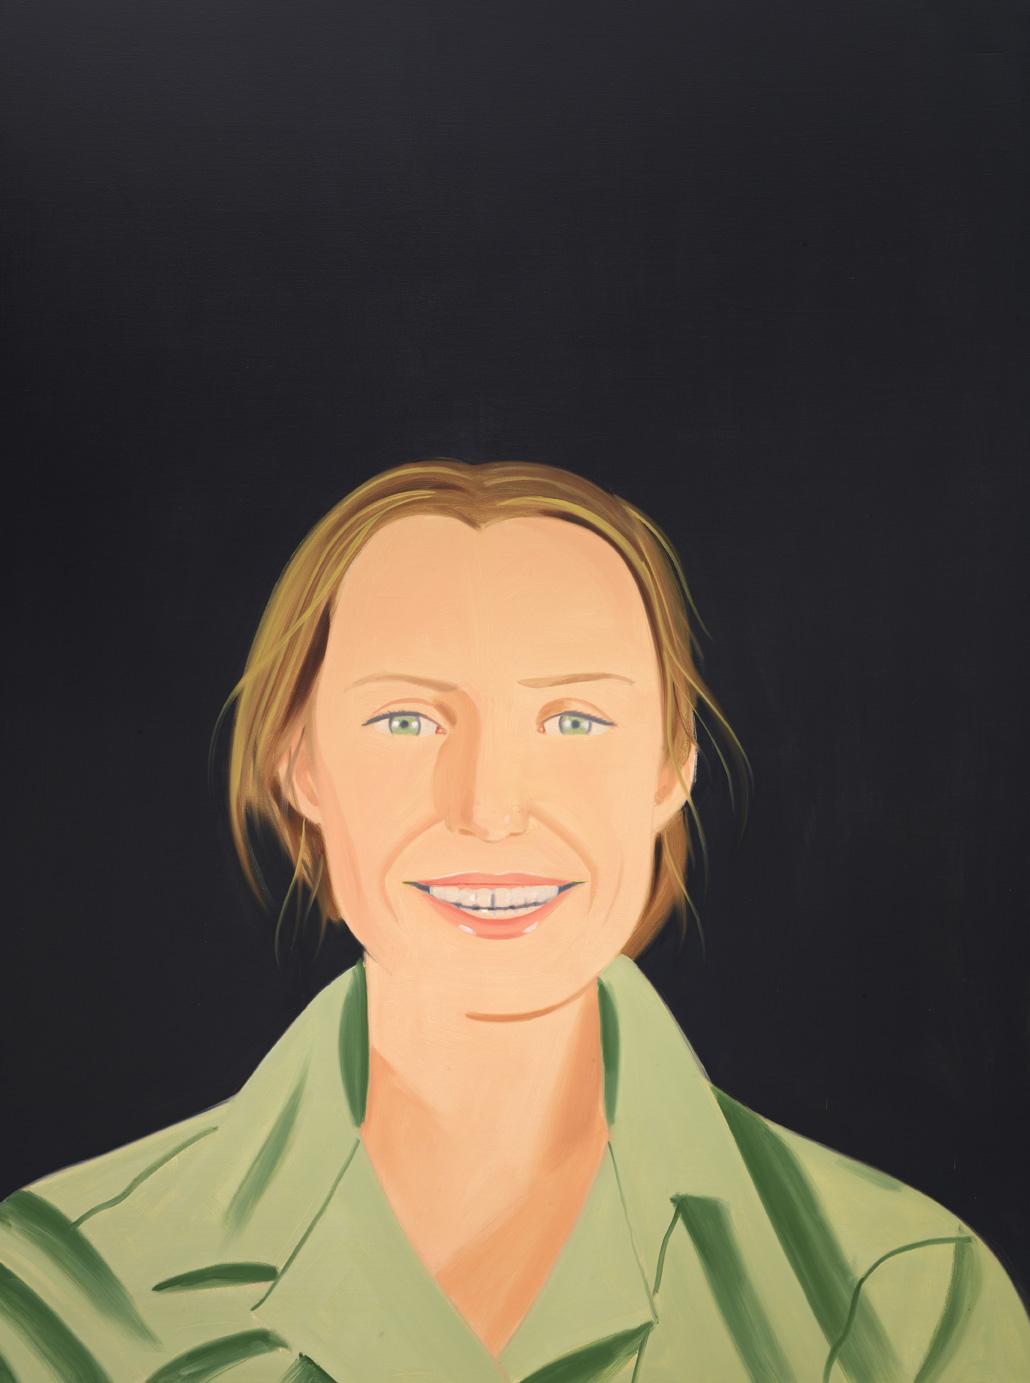 Lauren Smiles | Alex Katz | Guggenheim Bilbao Museoa